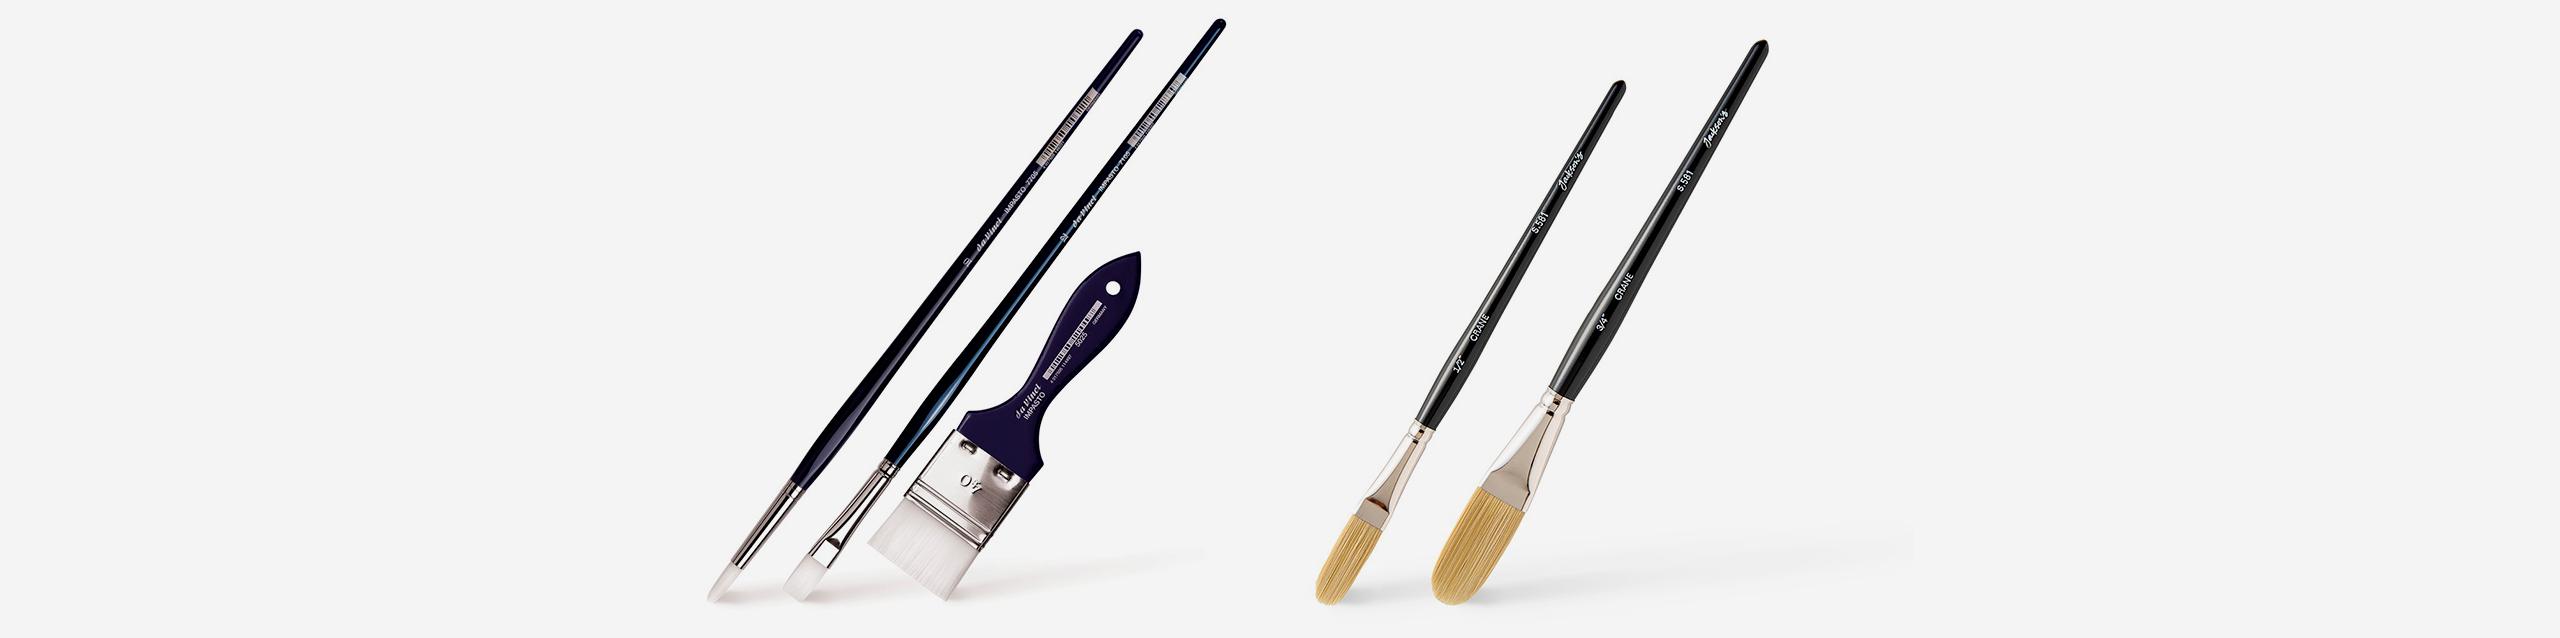 L-R: Da Vinci Impasto brushes, Jackson's Crane brushes